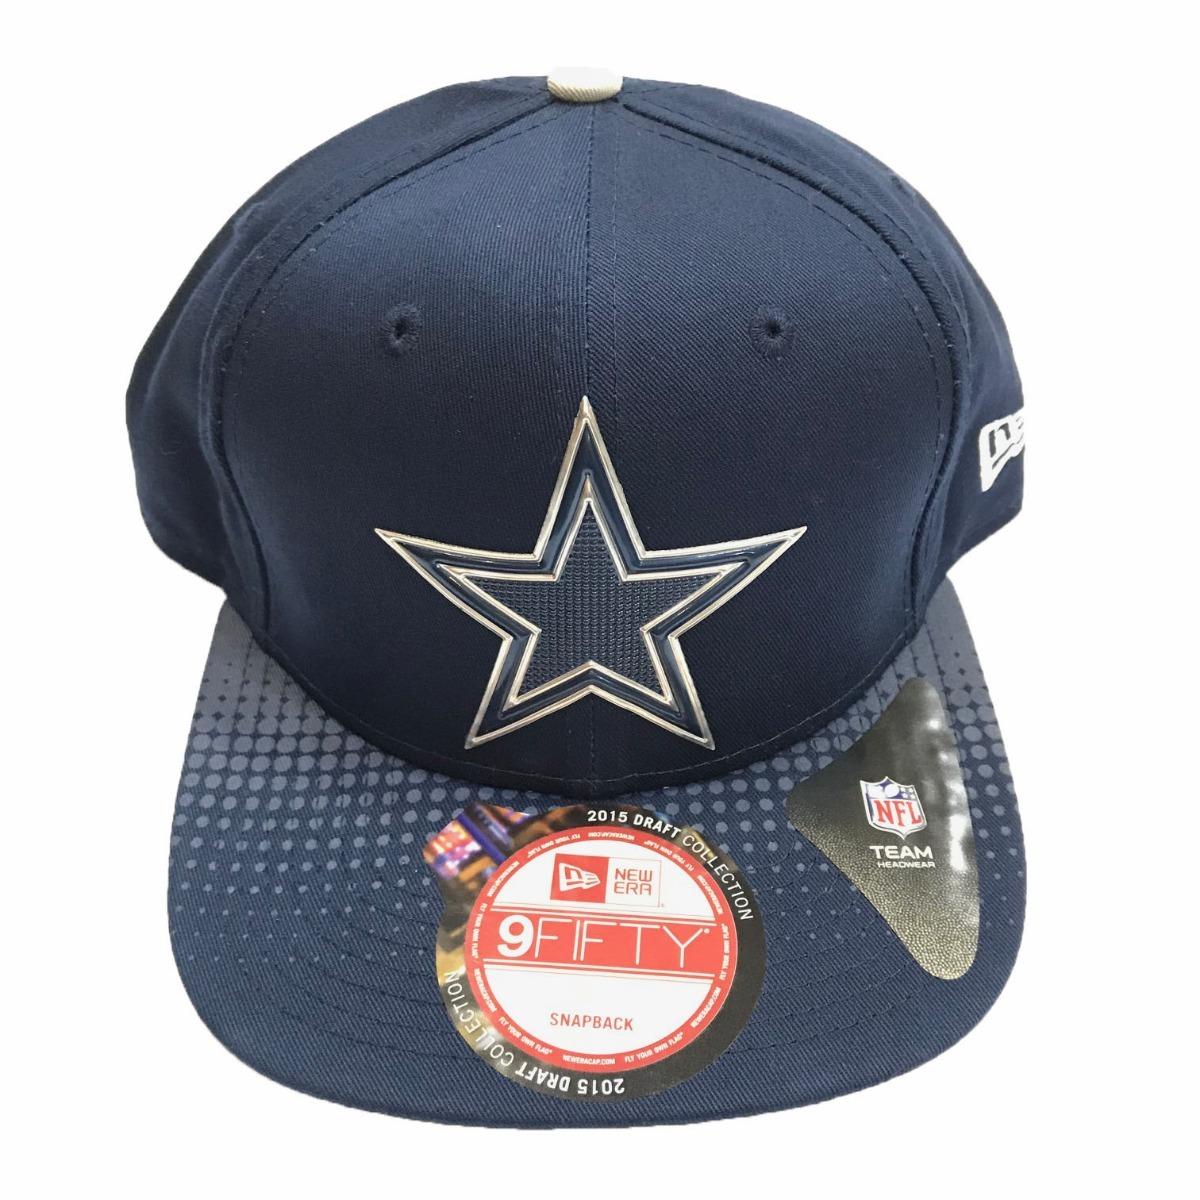 boné new era nfl dallas cowboys draft snapback. Carregando zoom. 6085c5095ef